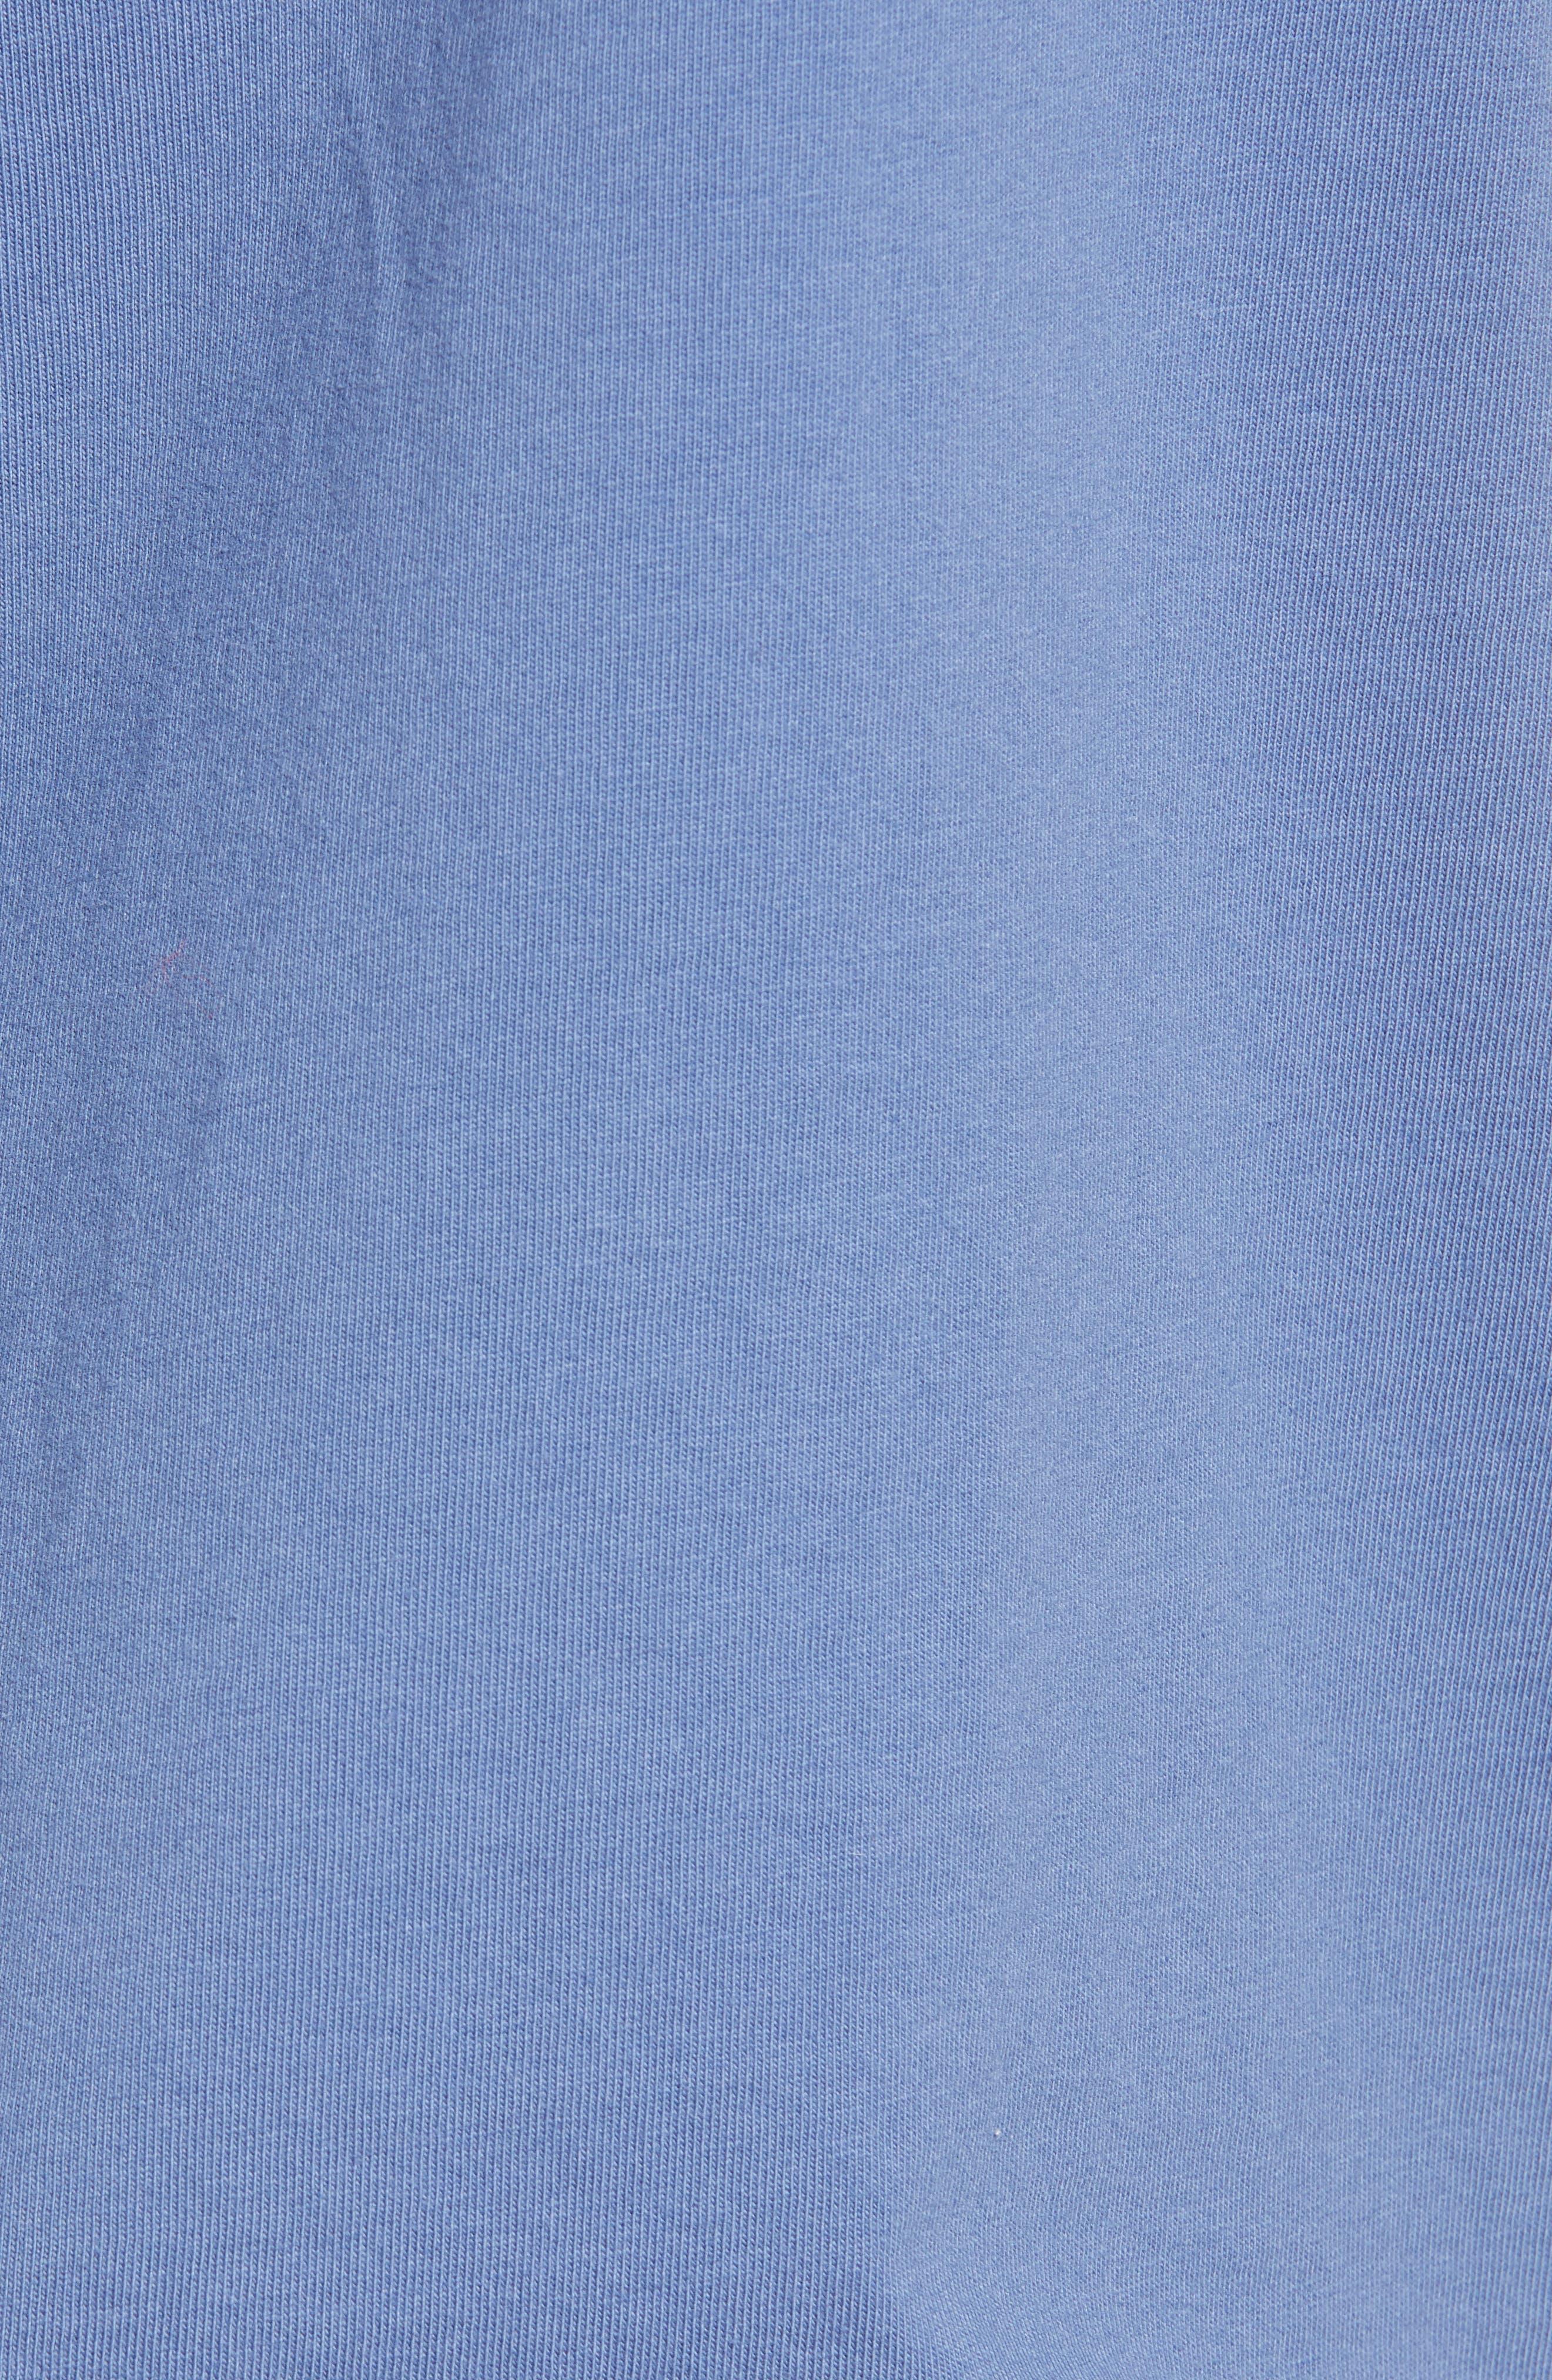 Whale Flag Pocket Tee,                             Alternate thumbnail 5, color,                             461